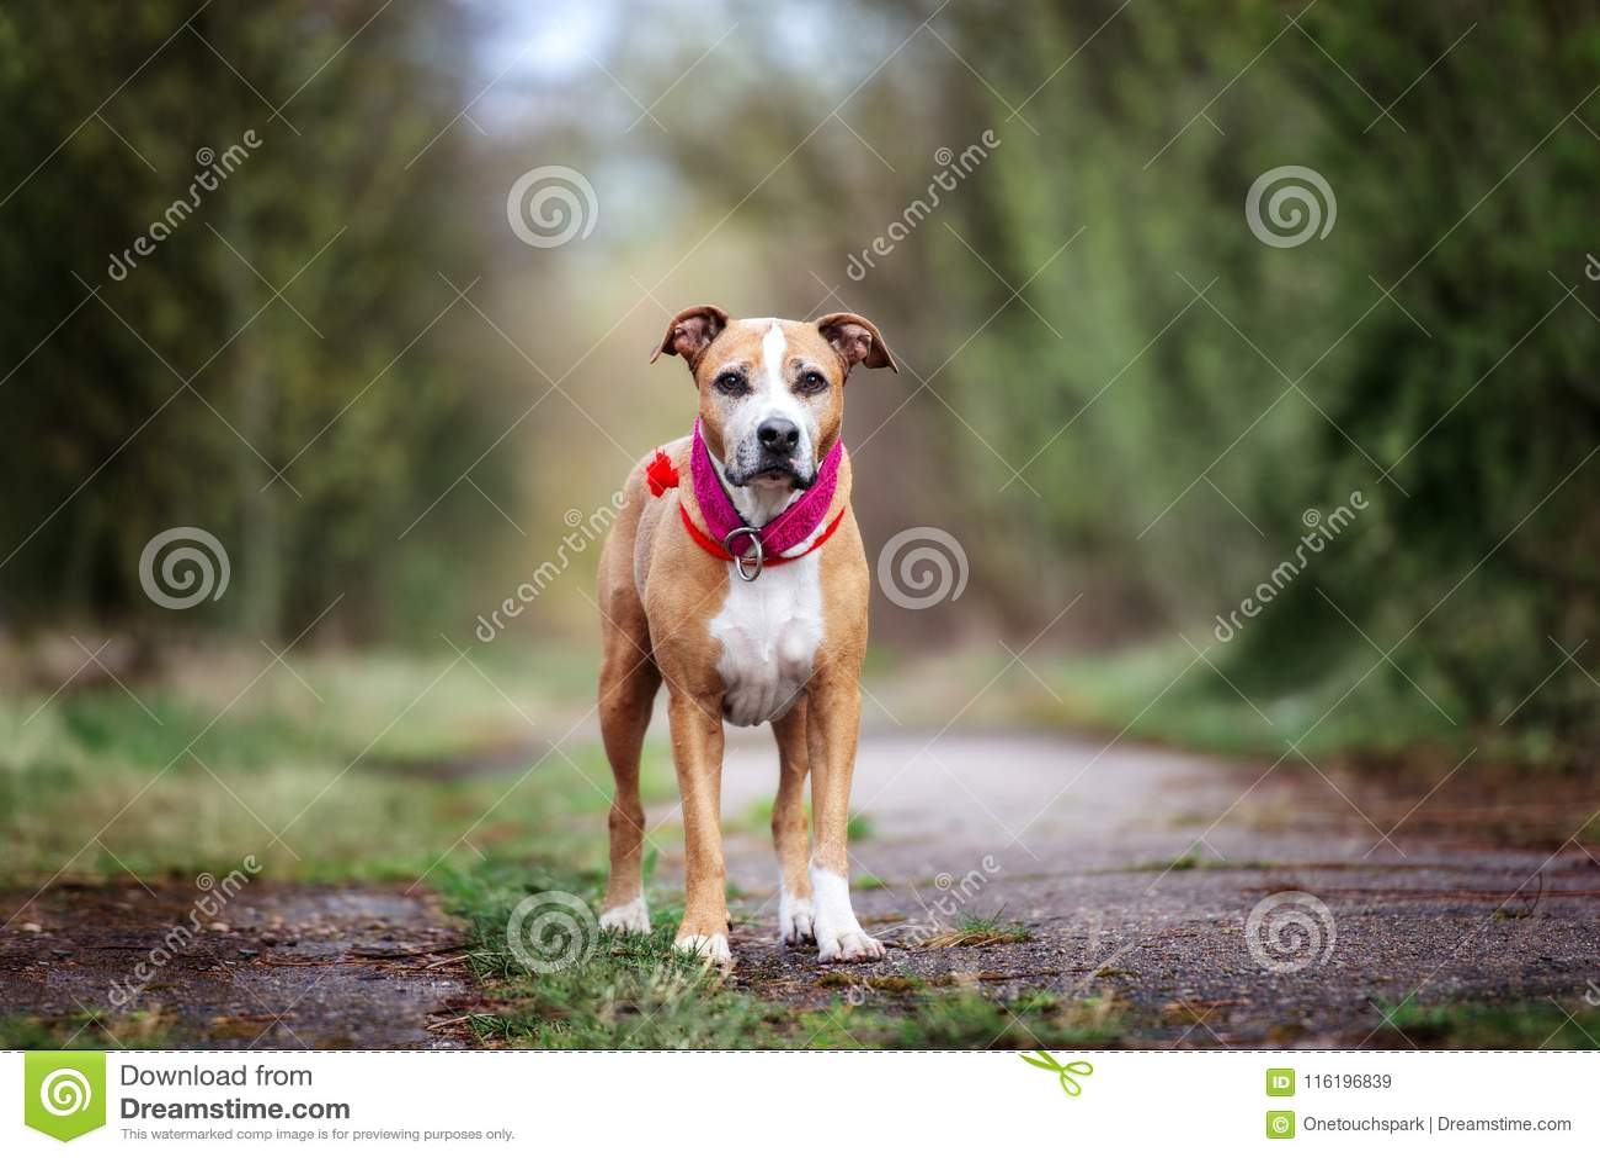 Perro americano del terrier de pitbull que presenta al aire libre